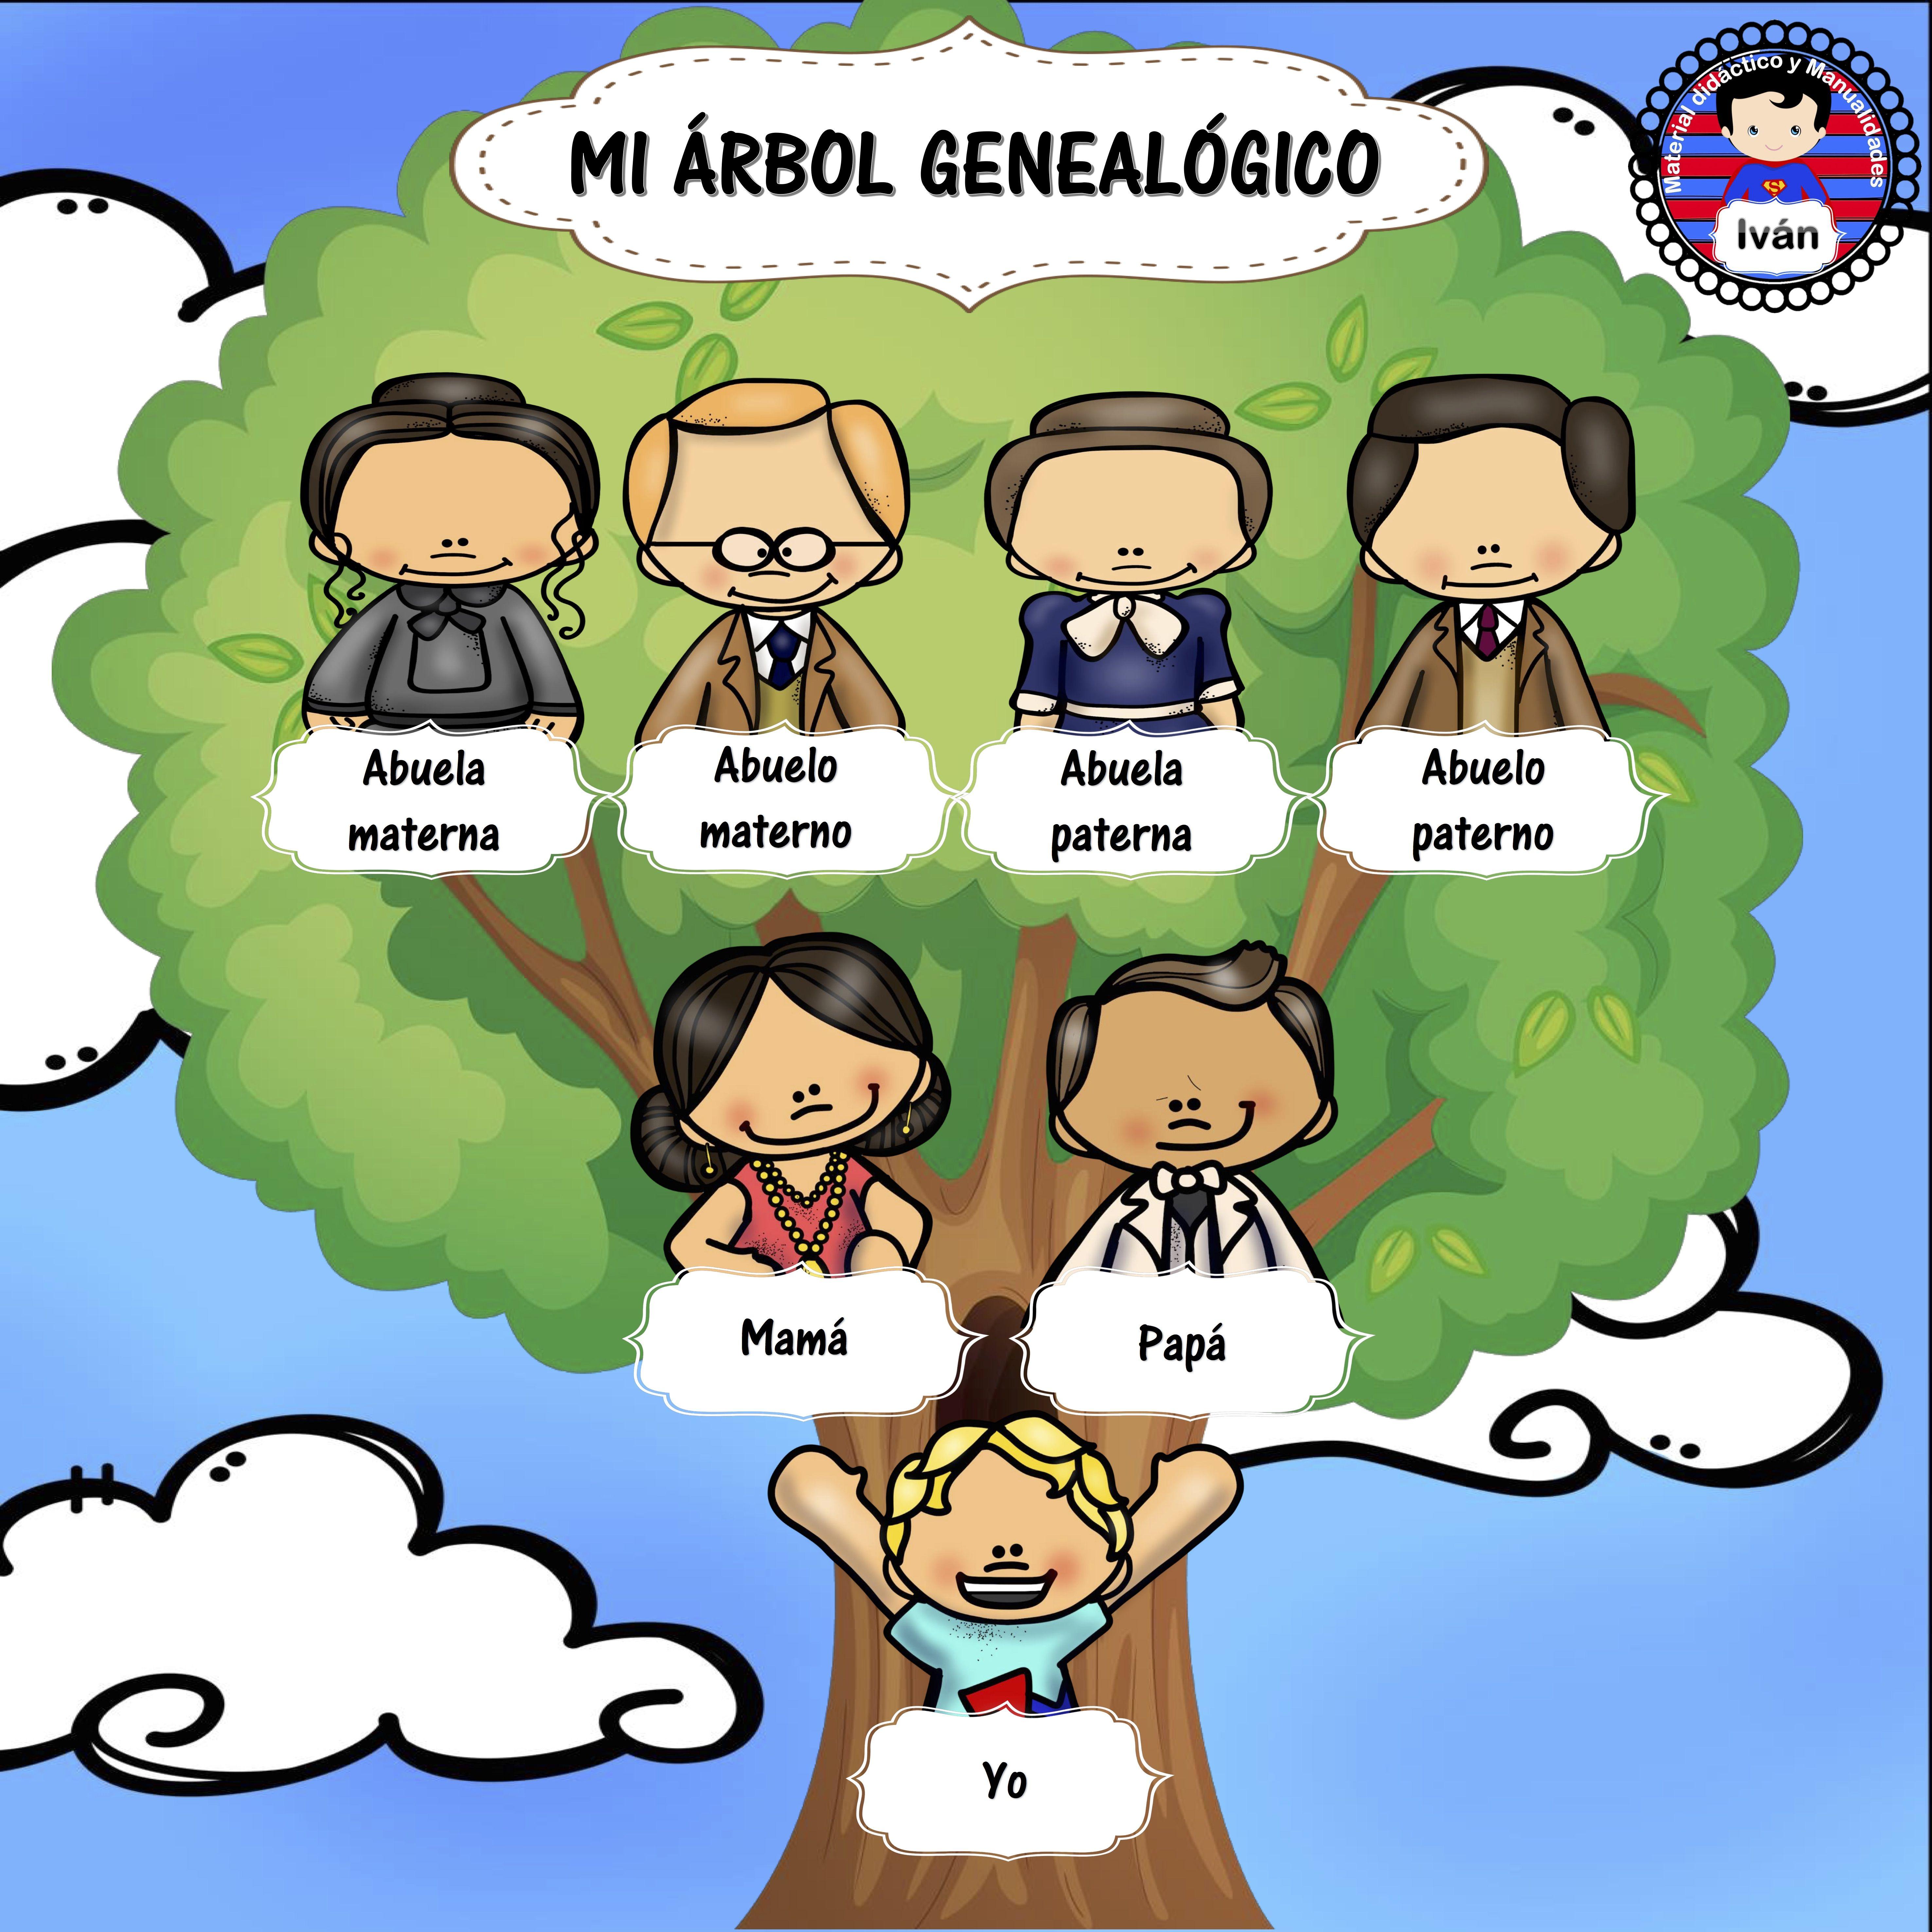 Mi arbol genealogico lona 5905 5905 pintura - Diseno arbol genealogico ...